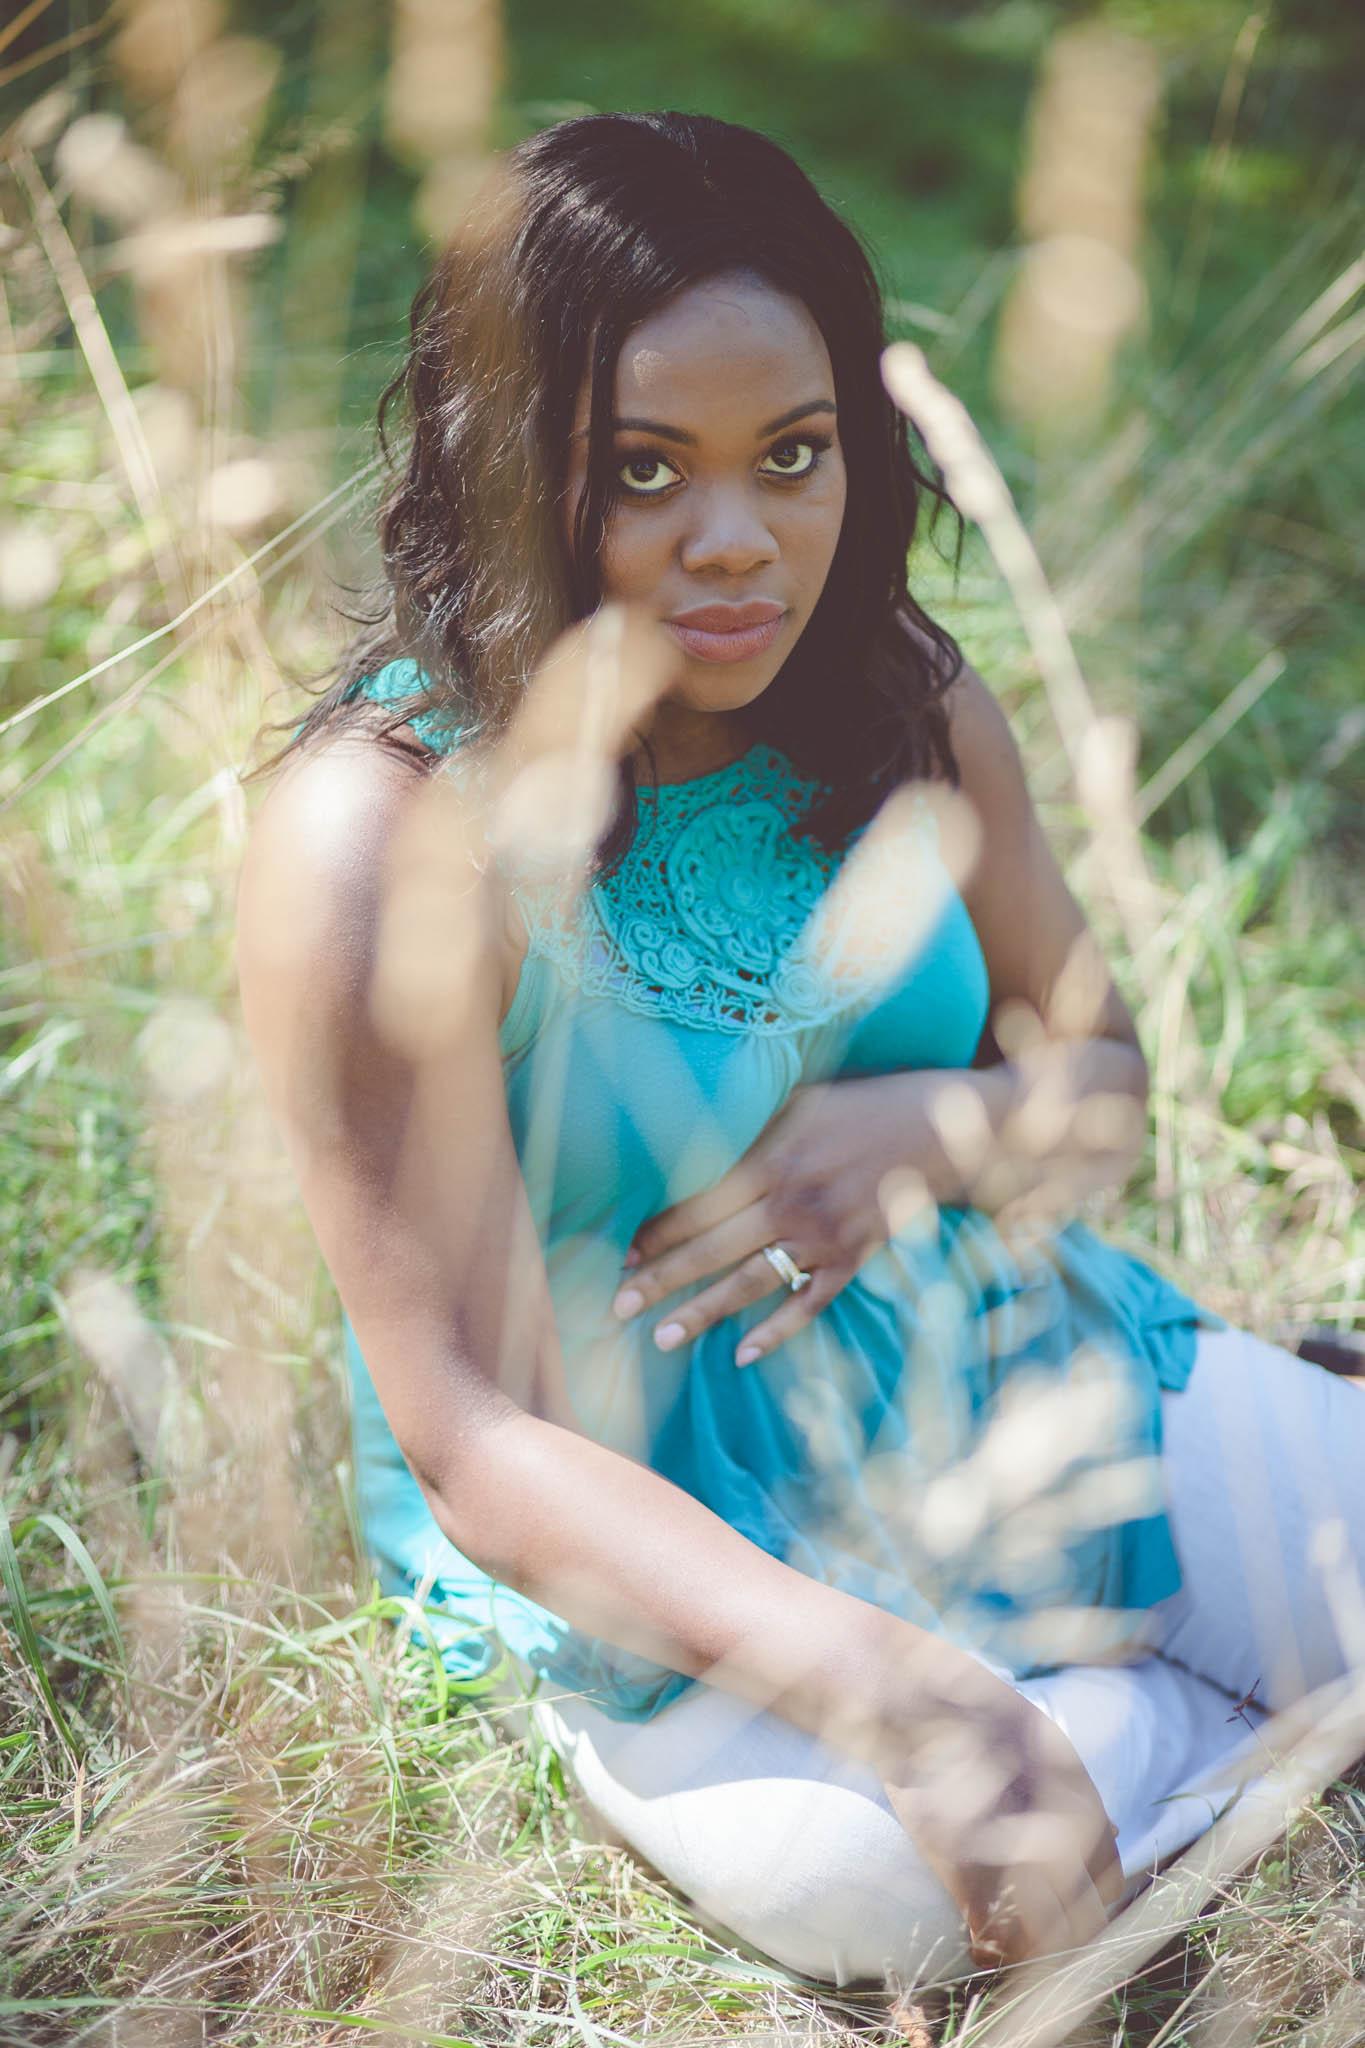 tacoma_Maternity_photographer.jpg